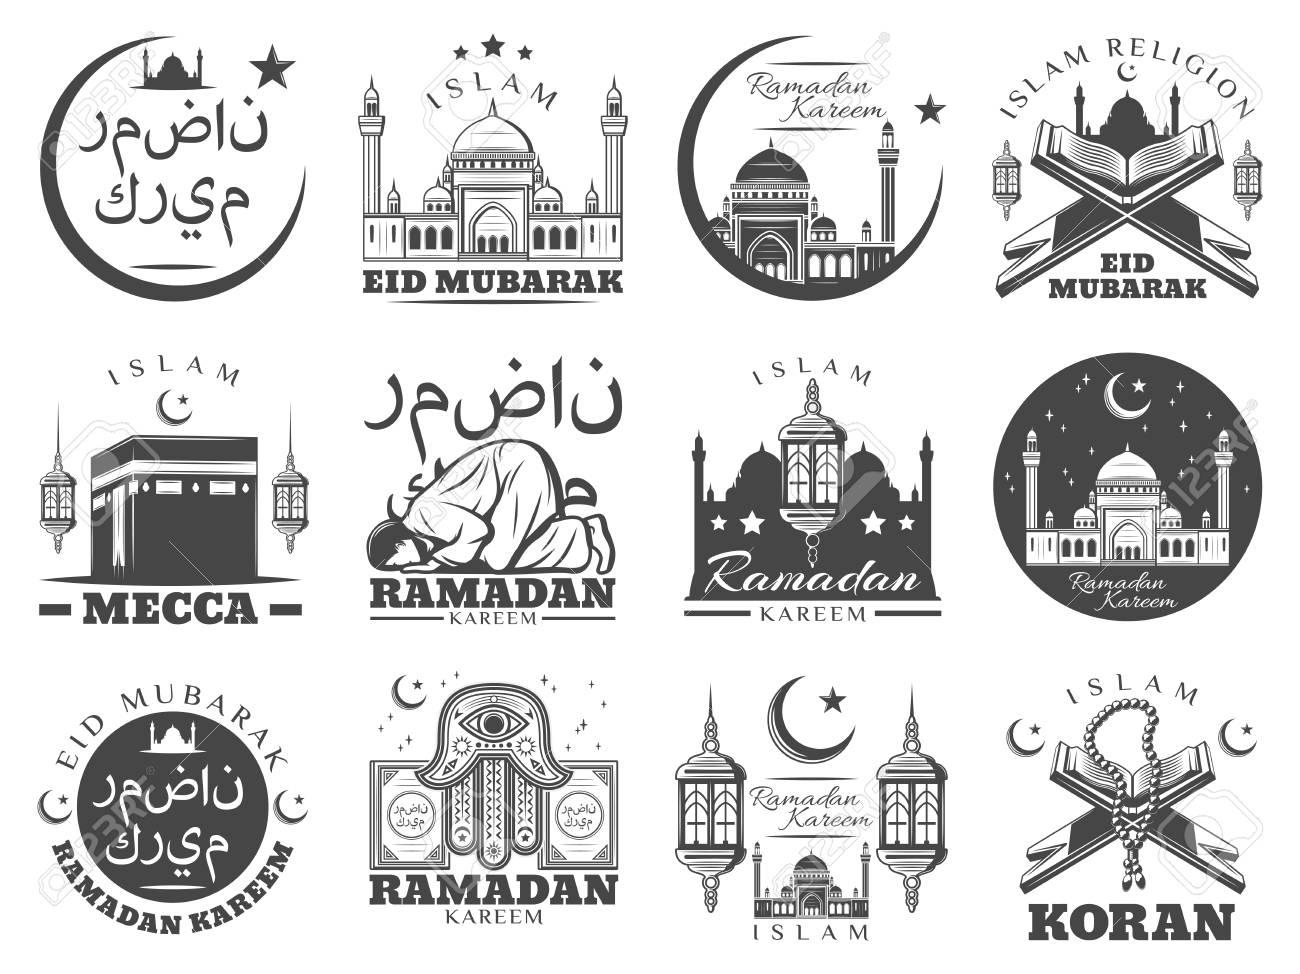 Ramadan Kareem and Eid Mubarak greeting icons of Islam religion holiday. Muslim mosque Kaaba in Mecca with crescent moon and star, Ramadan lantern, prayer and arabic calligraphy monochrome vector - 118668545